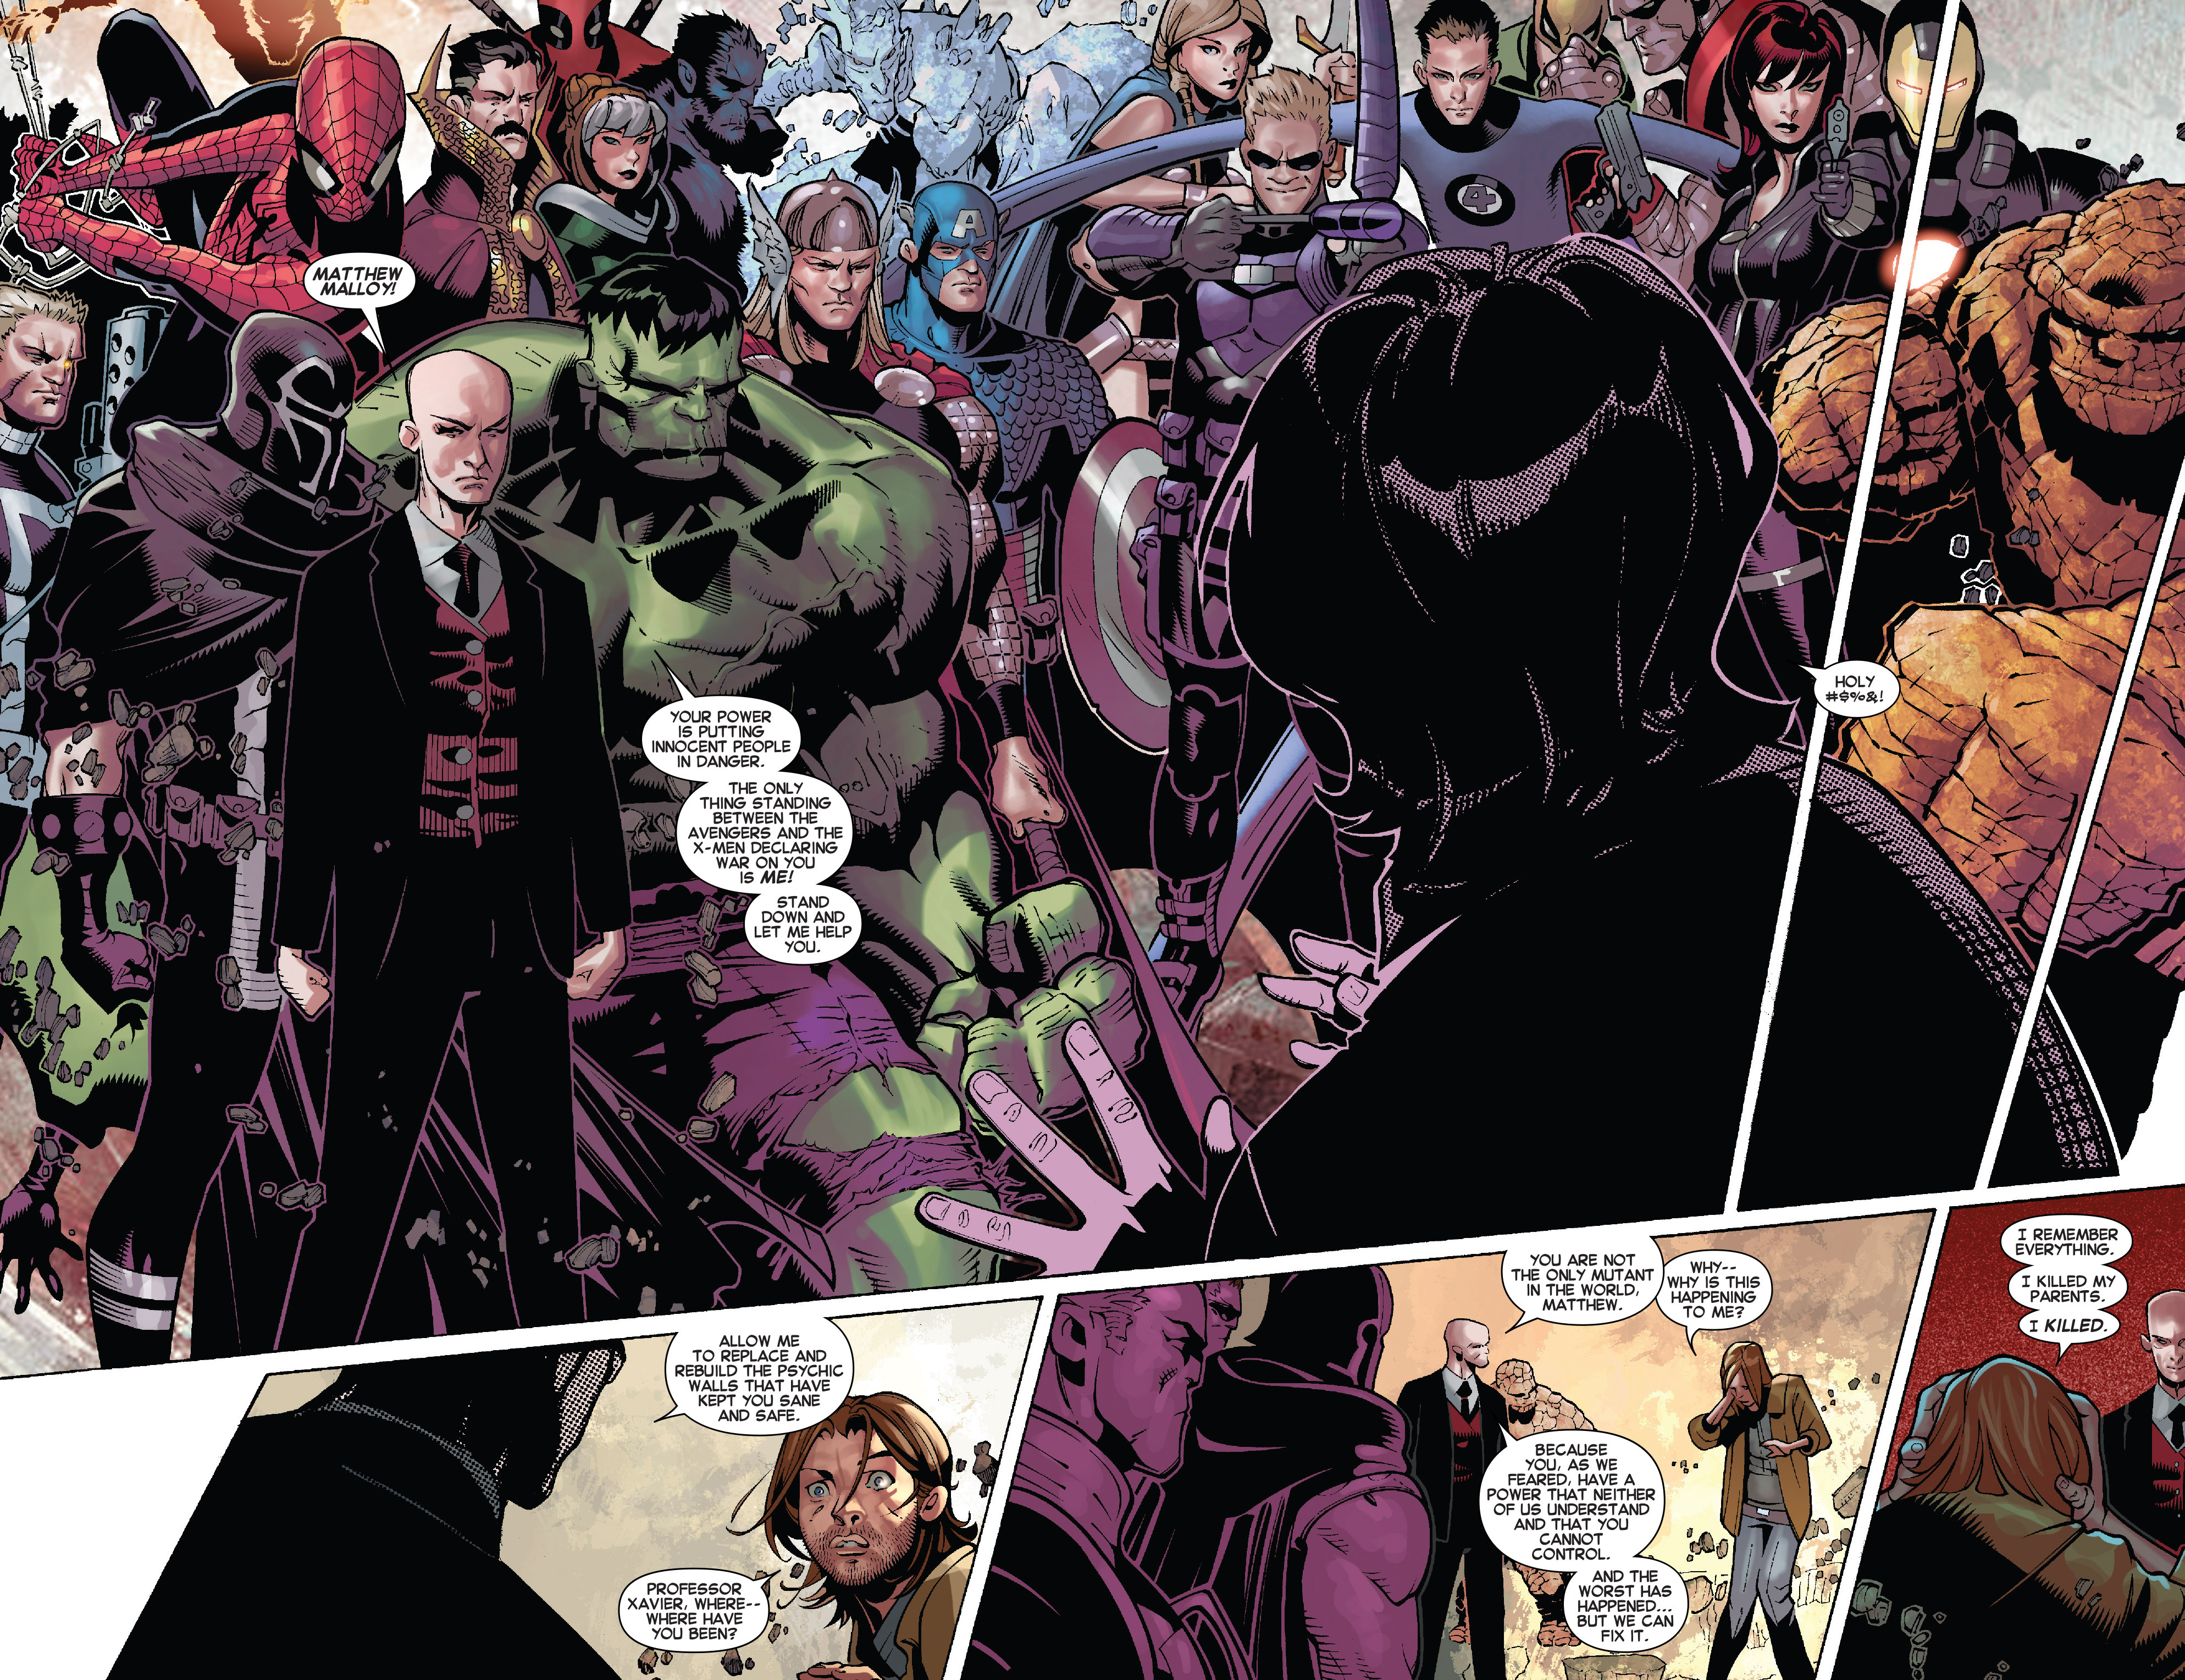 Read online Uncanny X-Men (2013) comic -  Issue # _TPB 5 - The Omega Mutant - 25